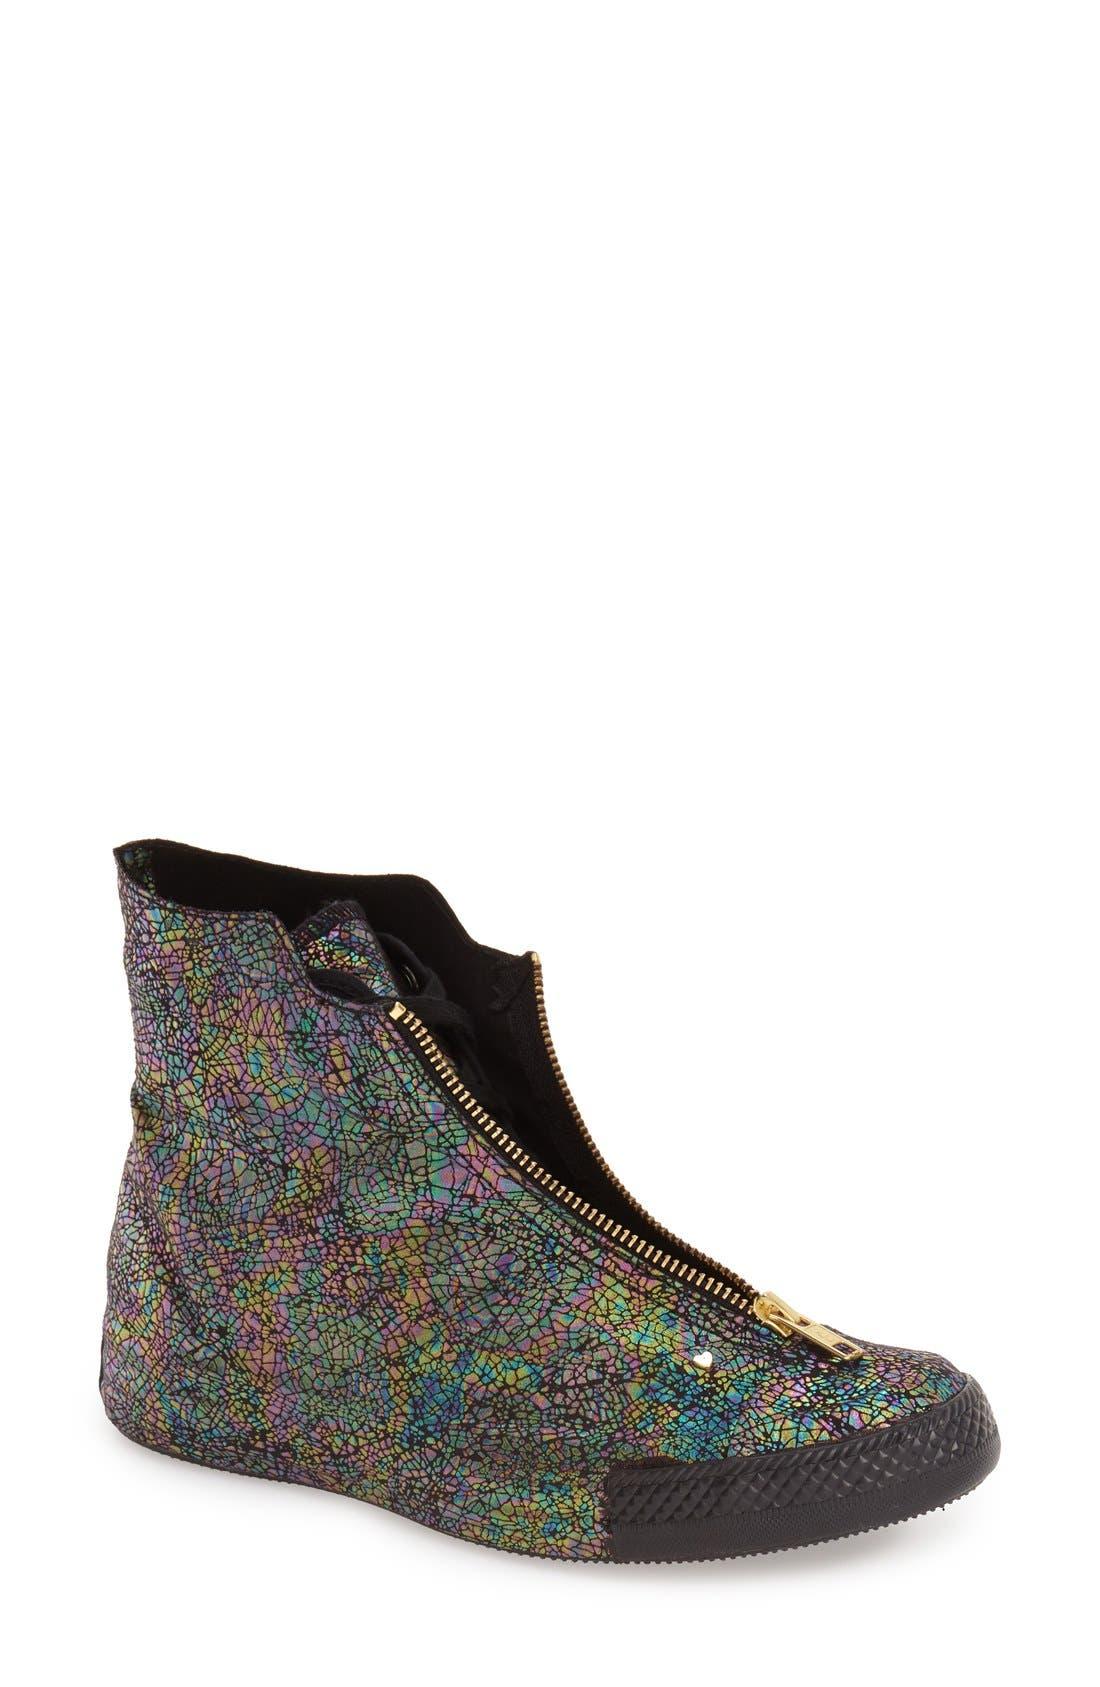 Main Image - Converse Chuck Taylor® All Star® 'Oil Slick Shroud' High Top Sneaker (Women)